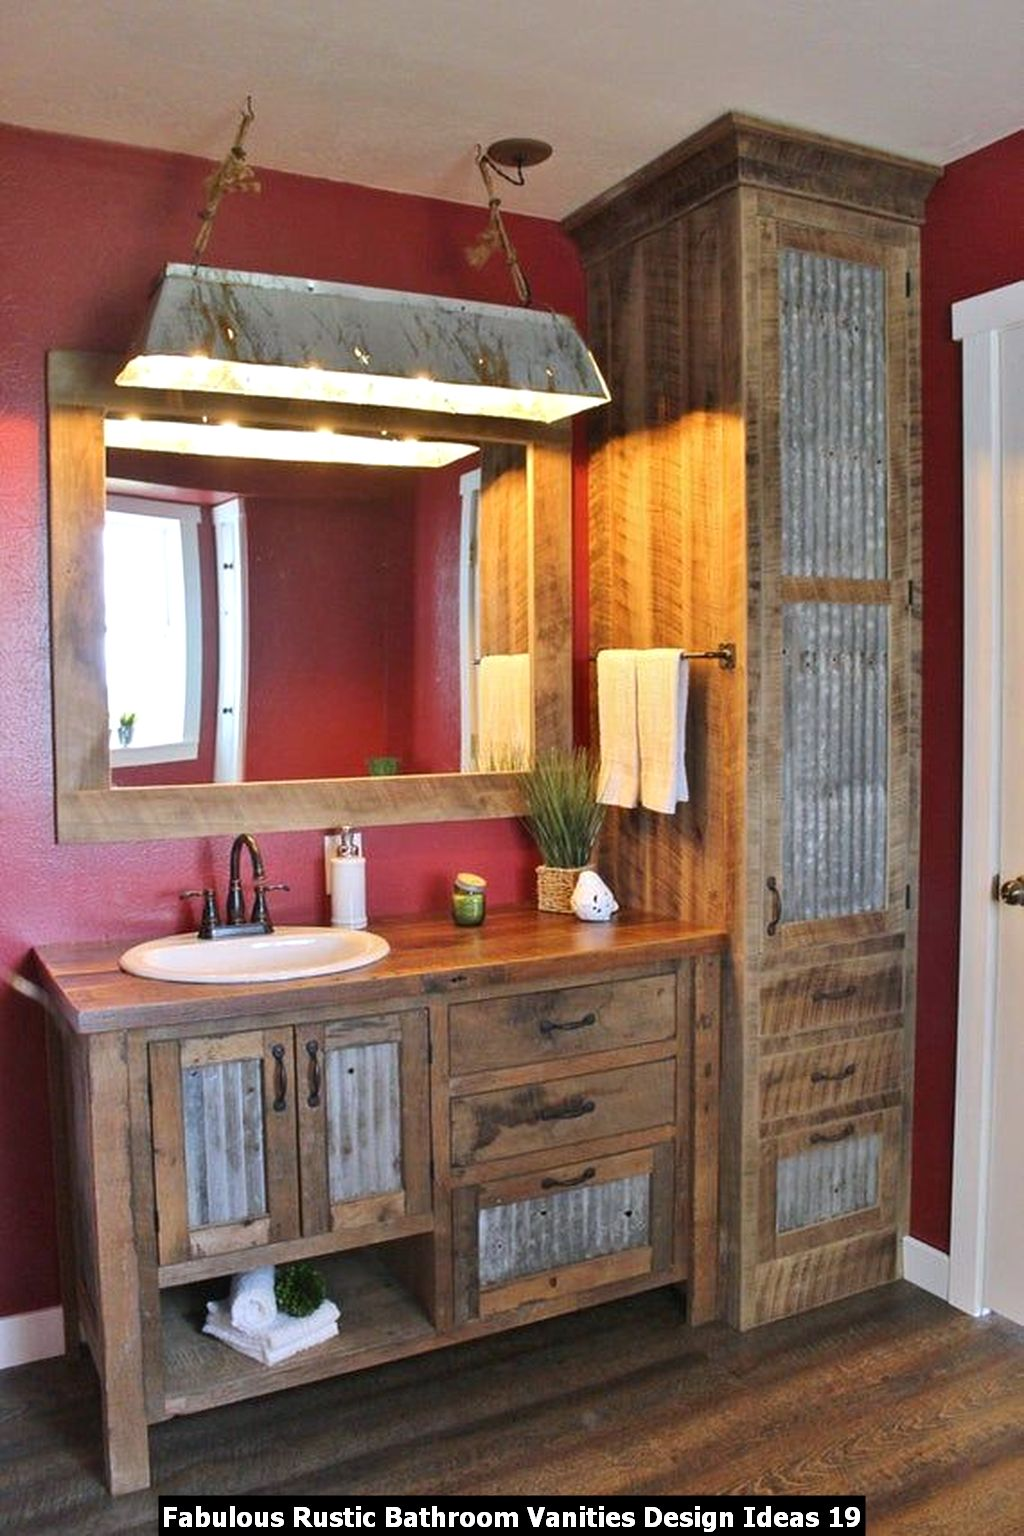 Fabulous Rustic Bathroom Vanities Design Ideas 19